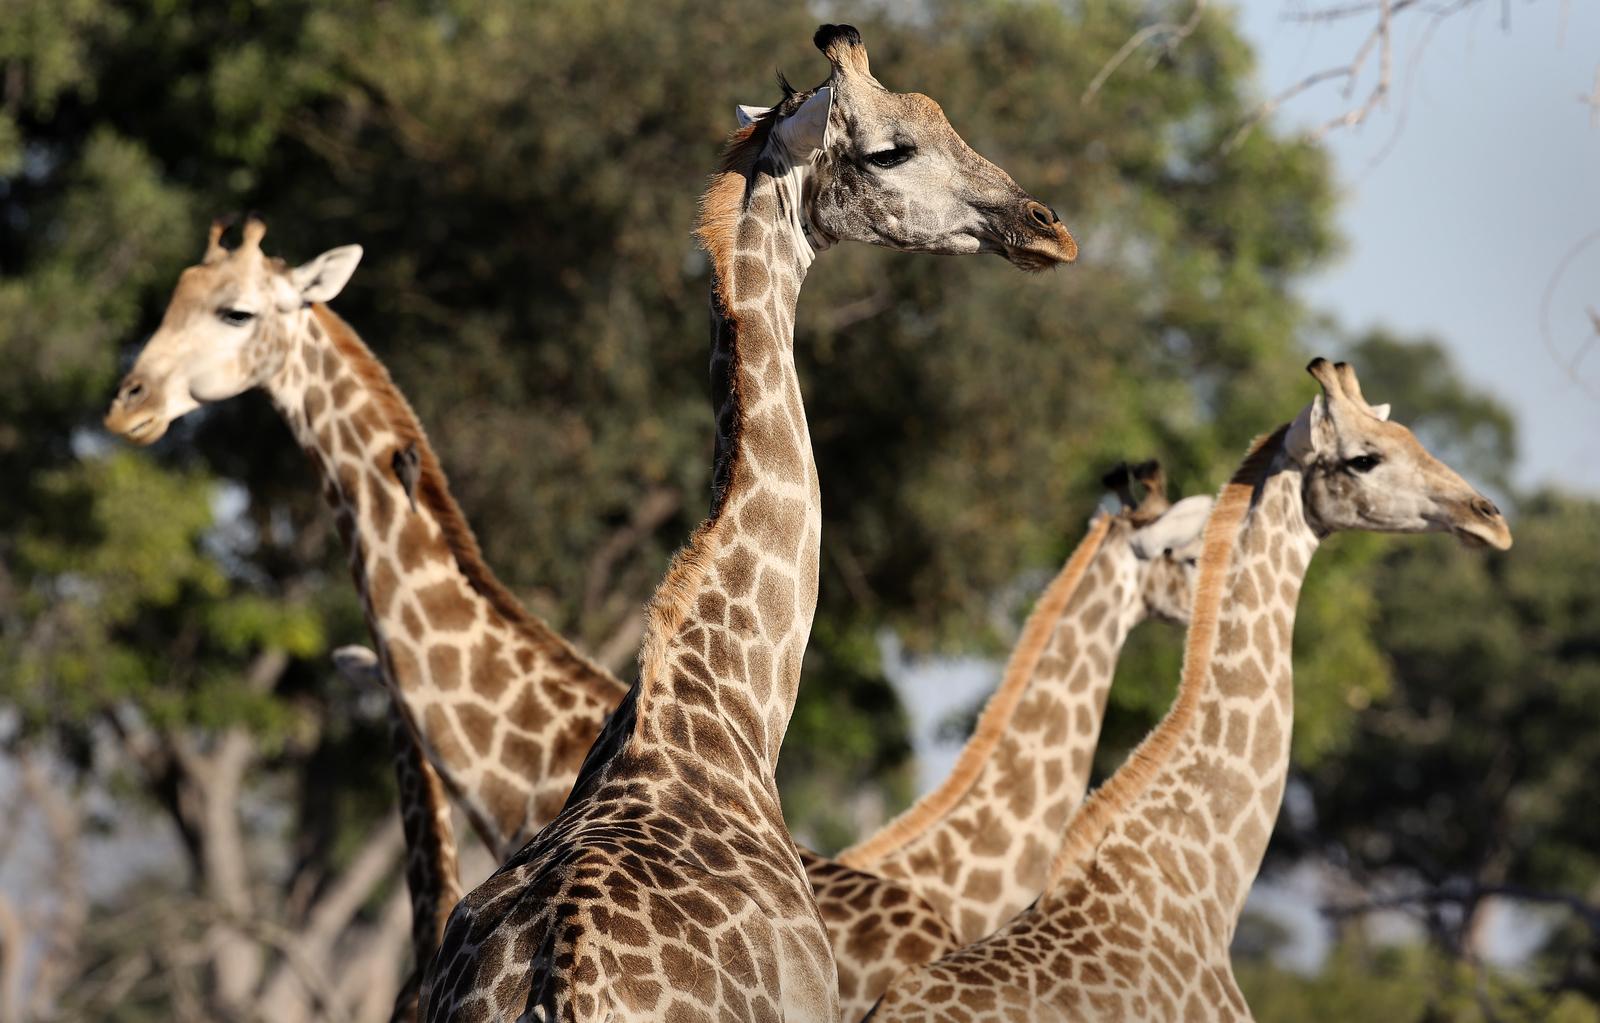 Six Interesting Facts About Giraffes